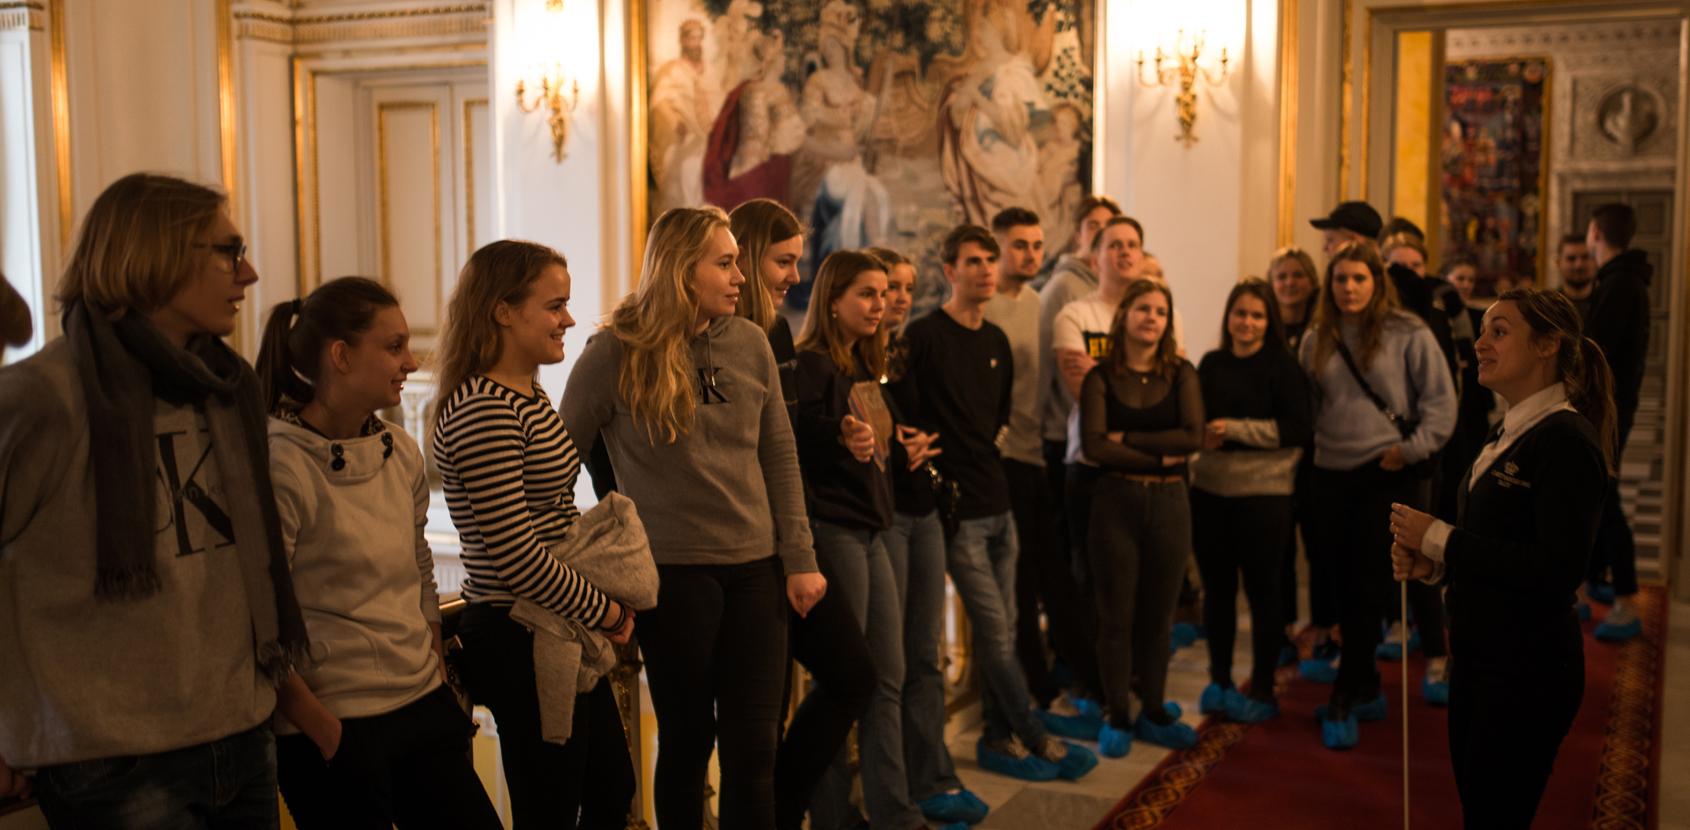 Undervisning på Kongetrappen_Christiansborg Slot_Foto Silas Staal.jpg